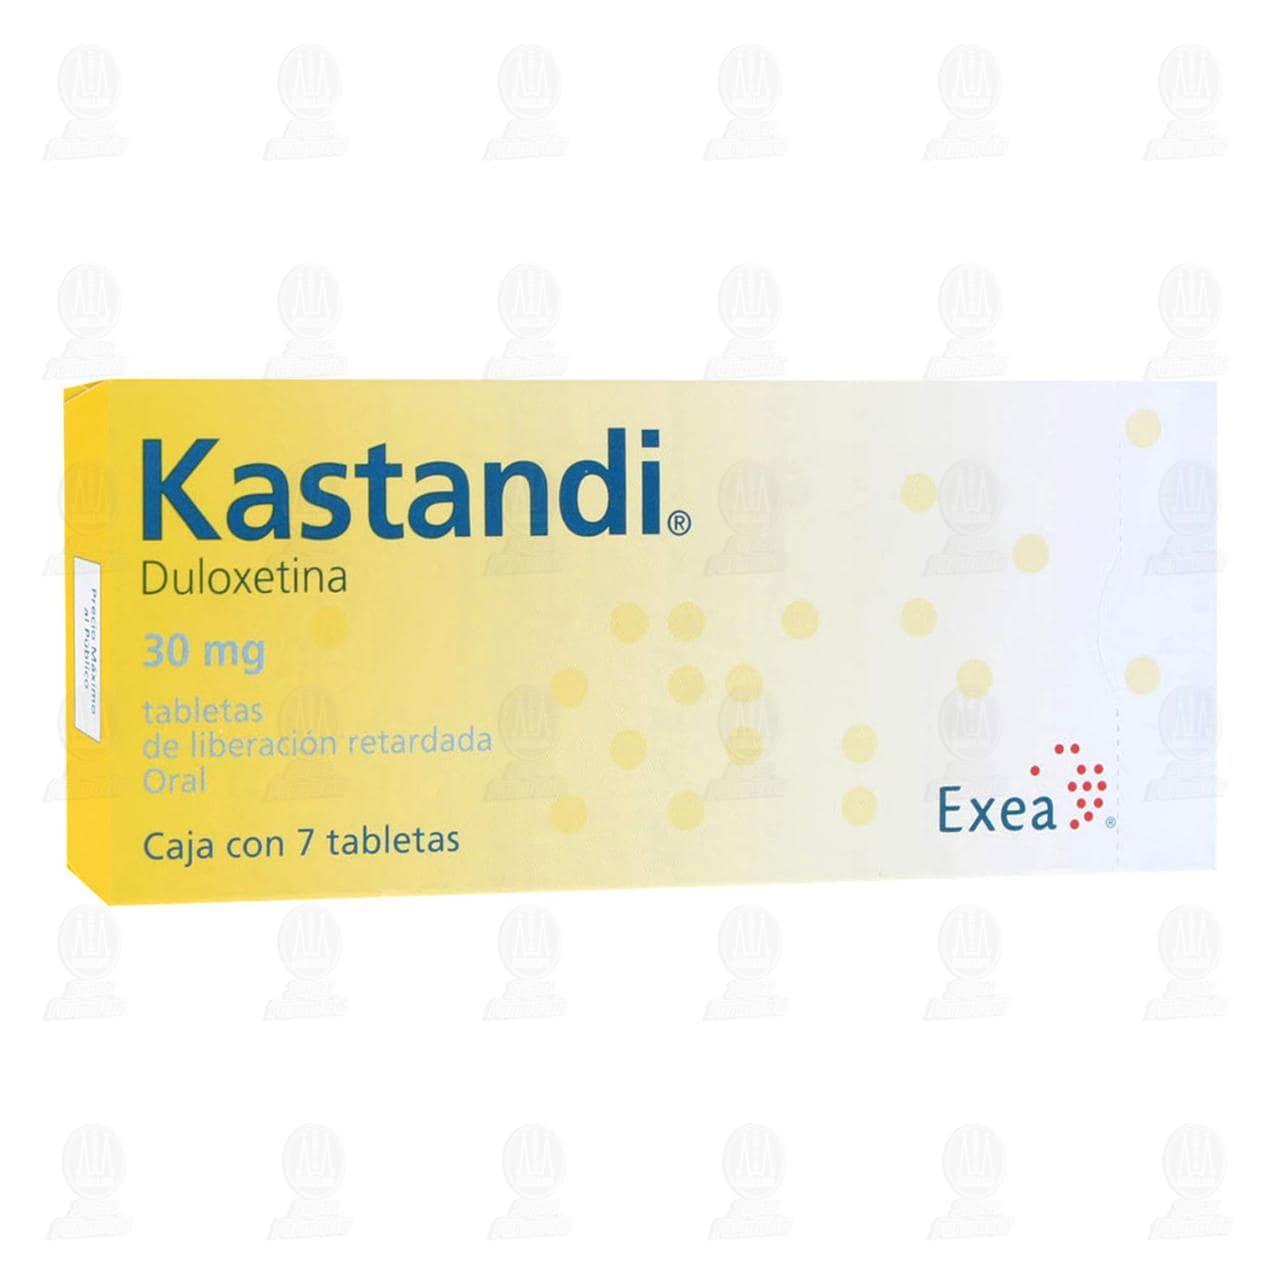 Comprar Kastandi 30mg 7 Tabletas en Farmacias Guadalajara